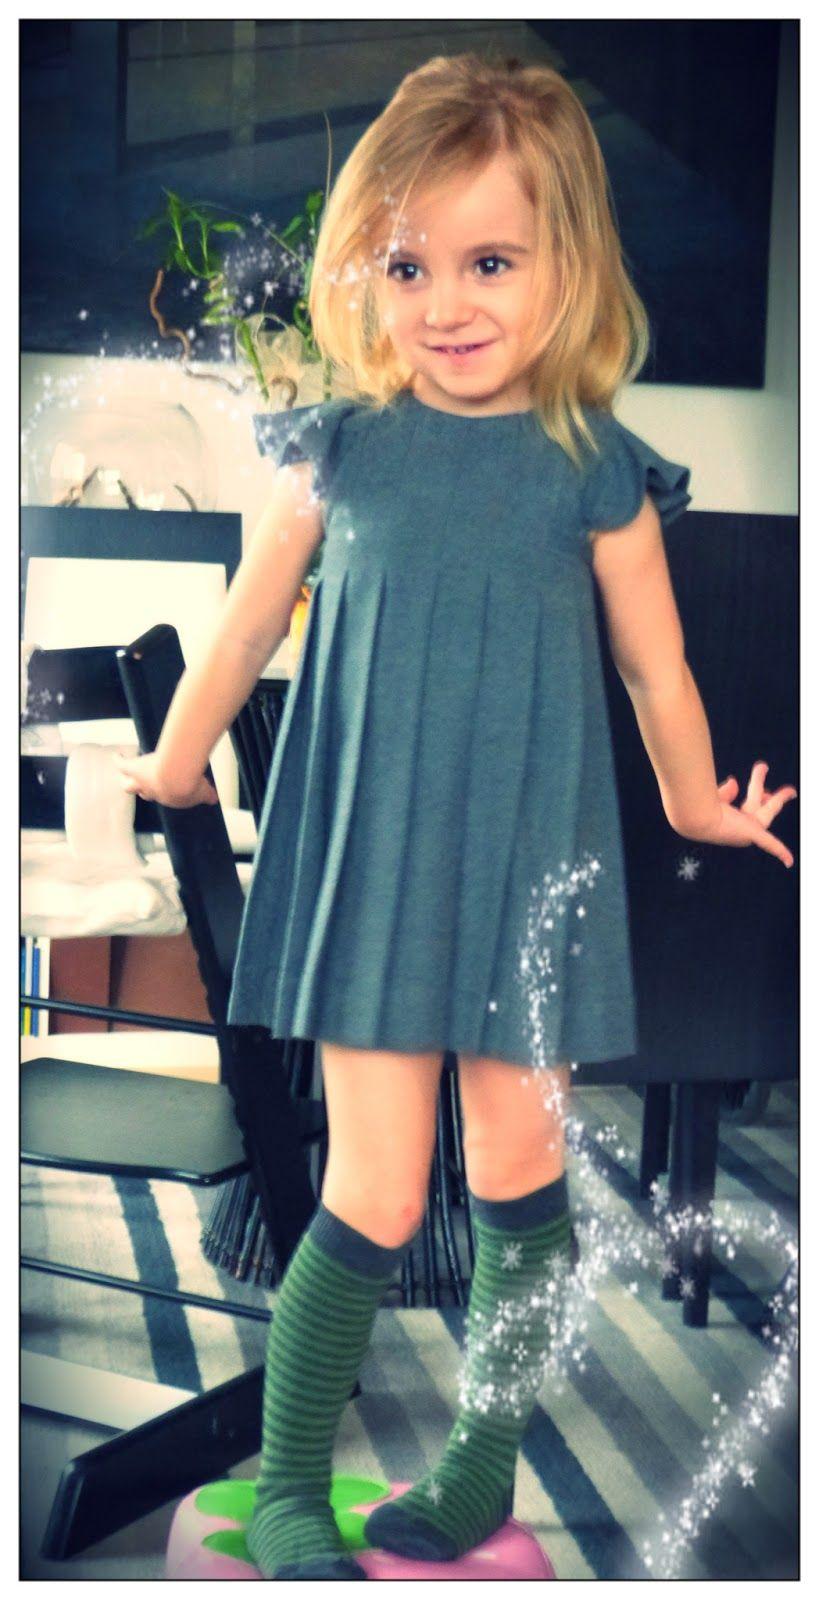 a5e6c438e119 No sin Valentina <3 | Cutie pie | Ropa para niñas, Vestidos para ...